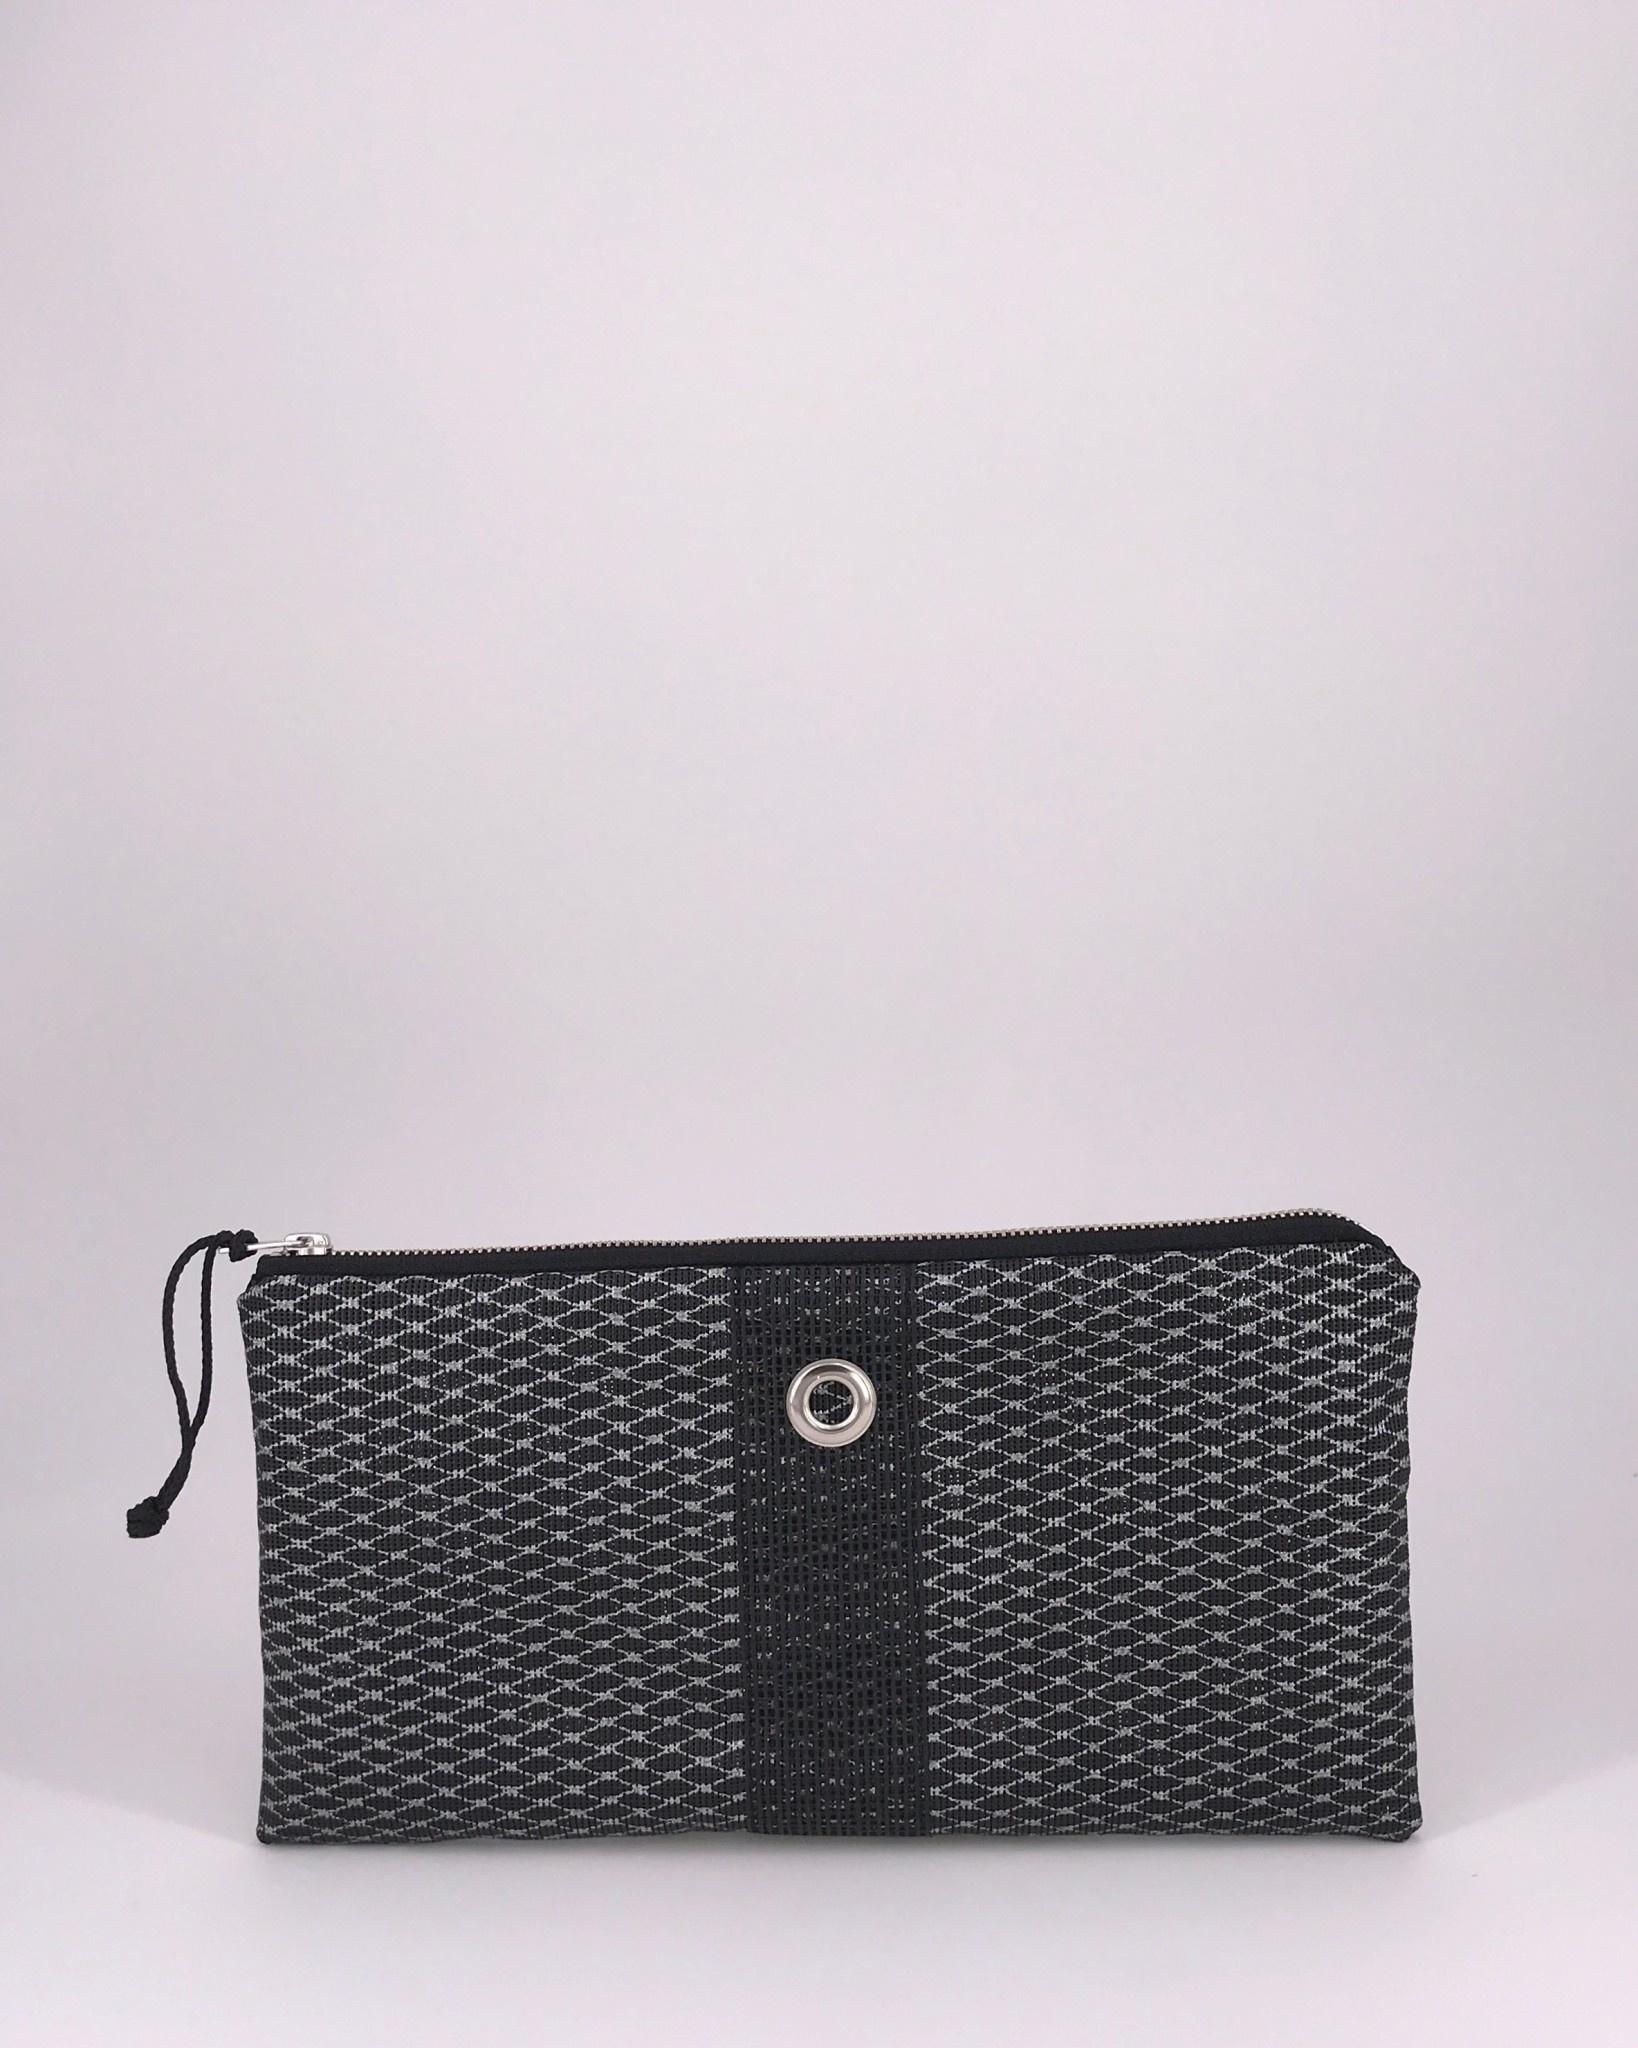 Alaina Marie ® Mini Silver Metallic on Black & Black Clutch